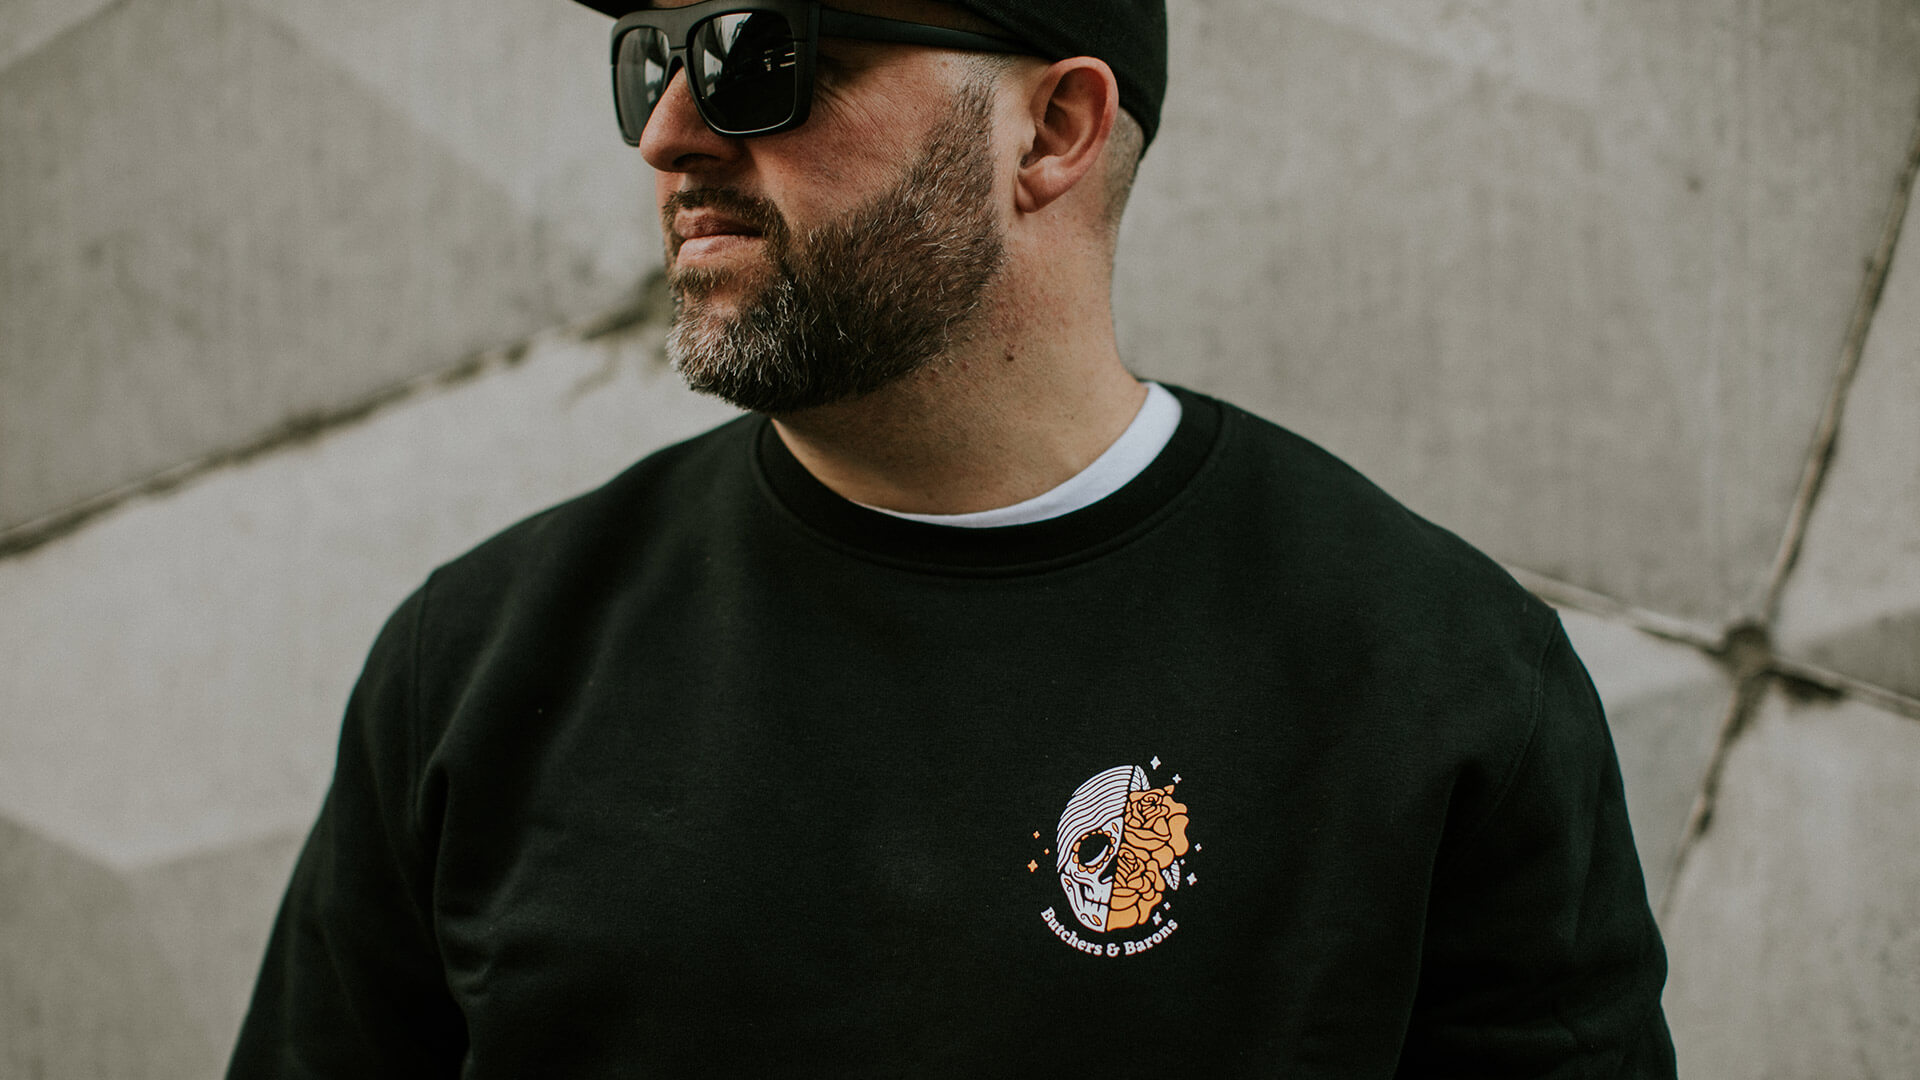 Flower + Skull black sweater by Butchers & Barons